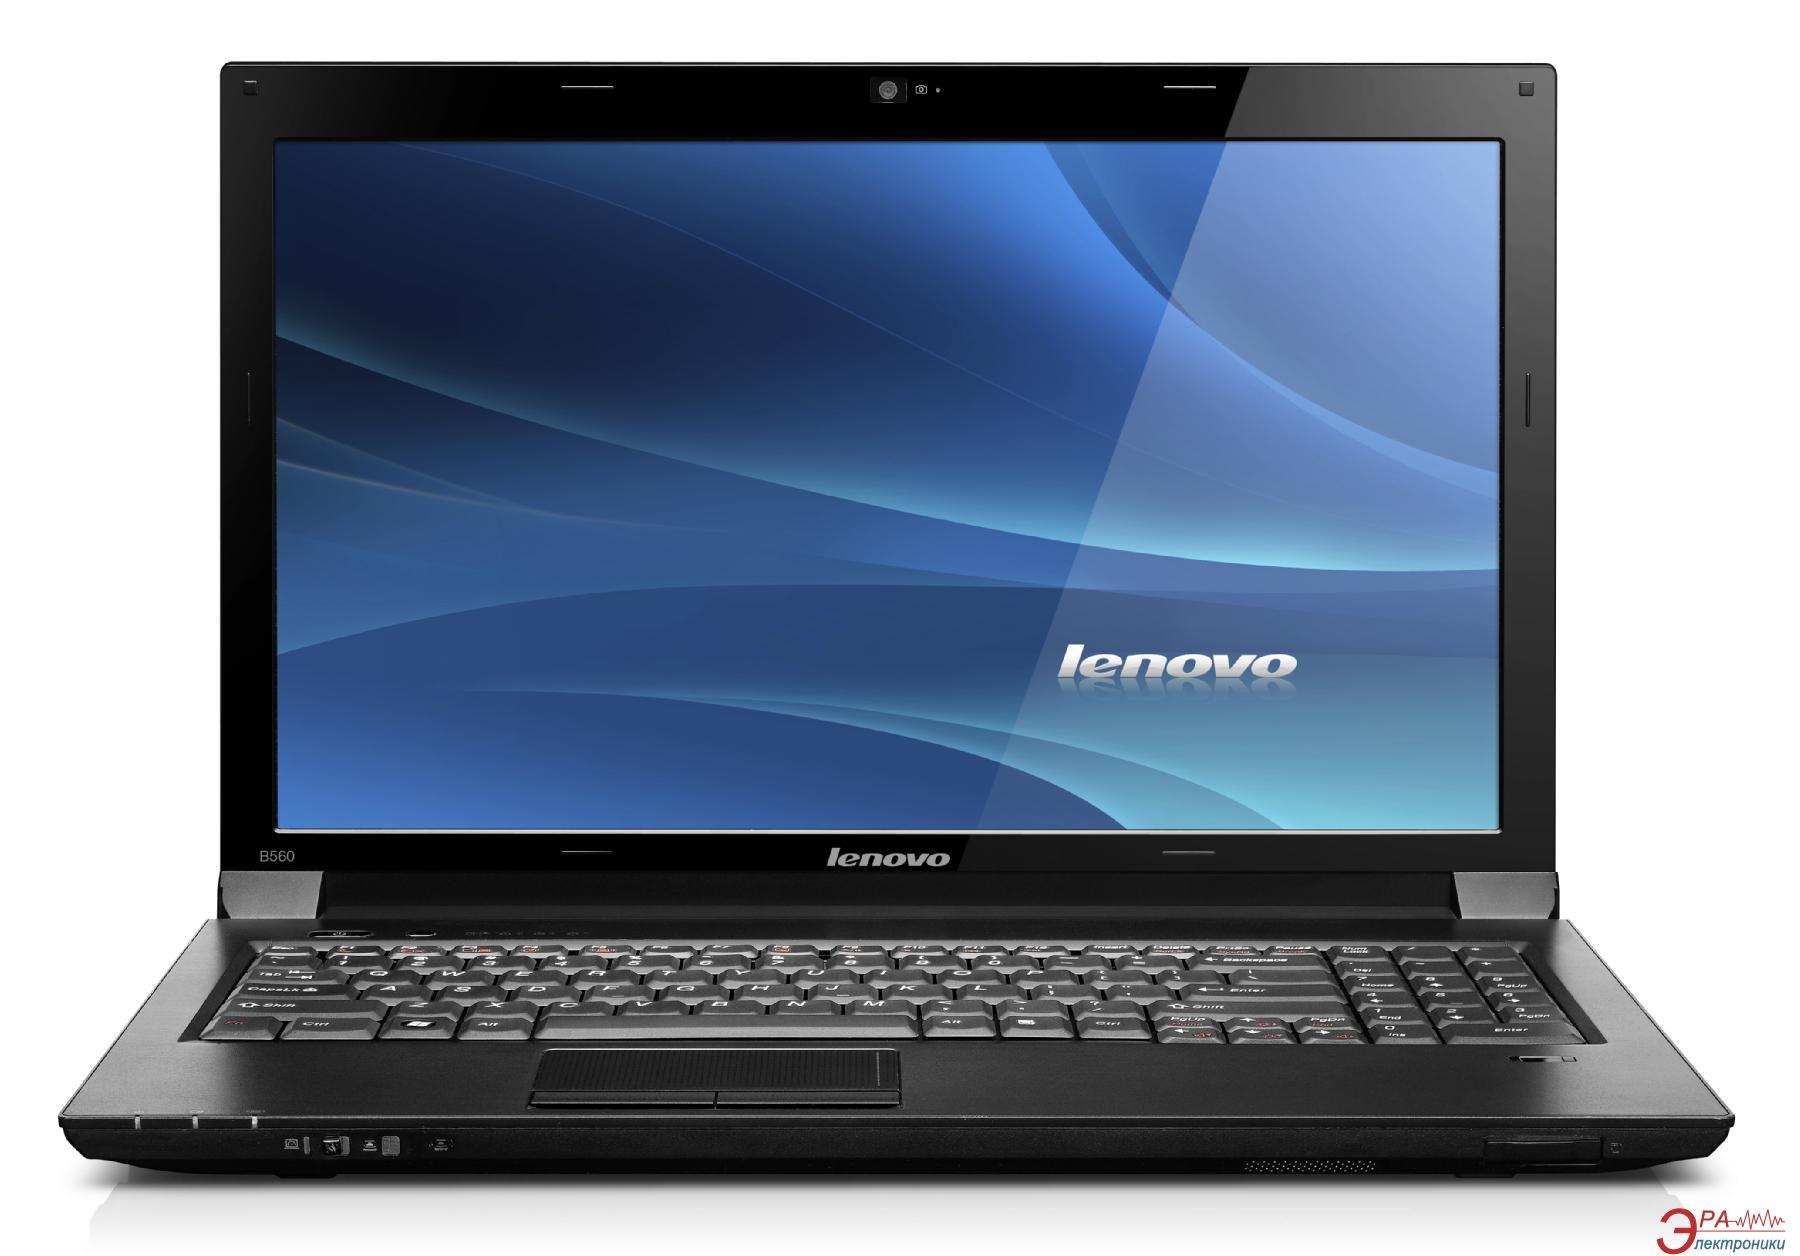 Ноутбук Lenovo IdeaPad B560-P62G-1 (59-300915) Black 15,6